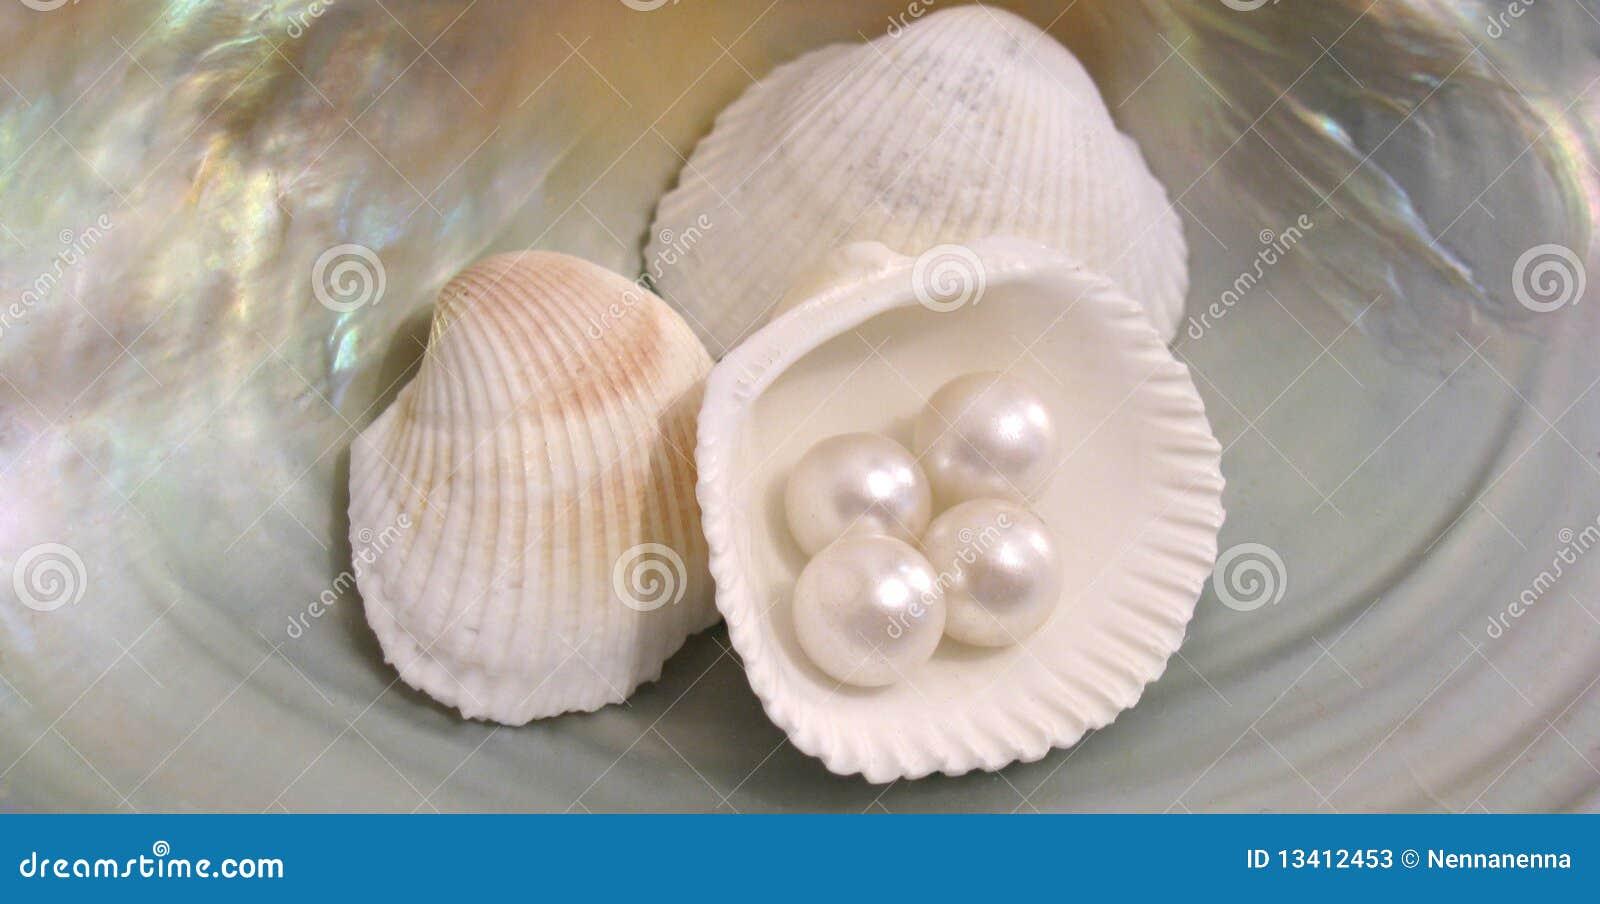 Download Beautiful Shells And Pearls Stock Image - Image of shellfish, shore: 13412453